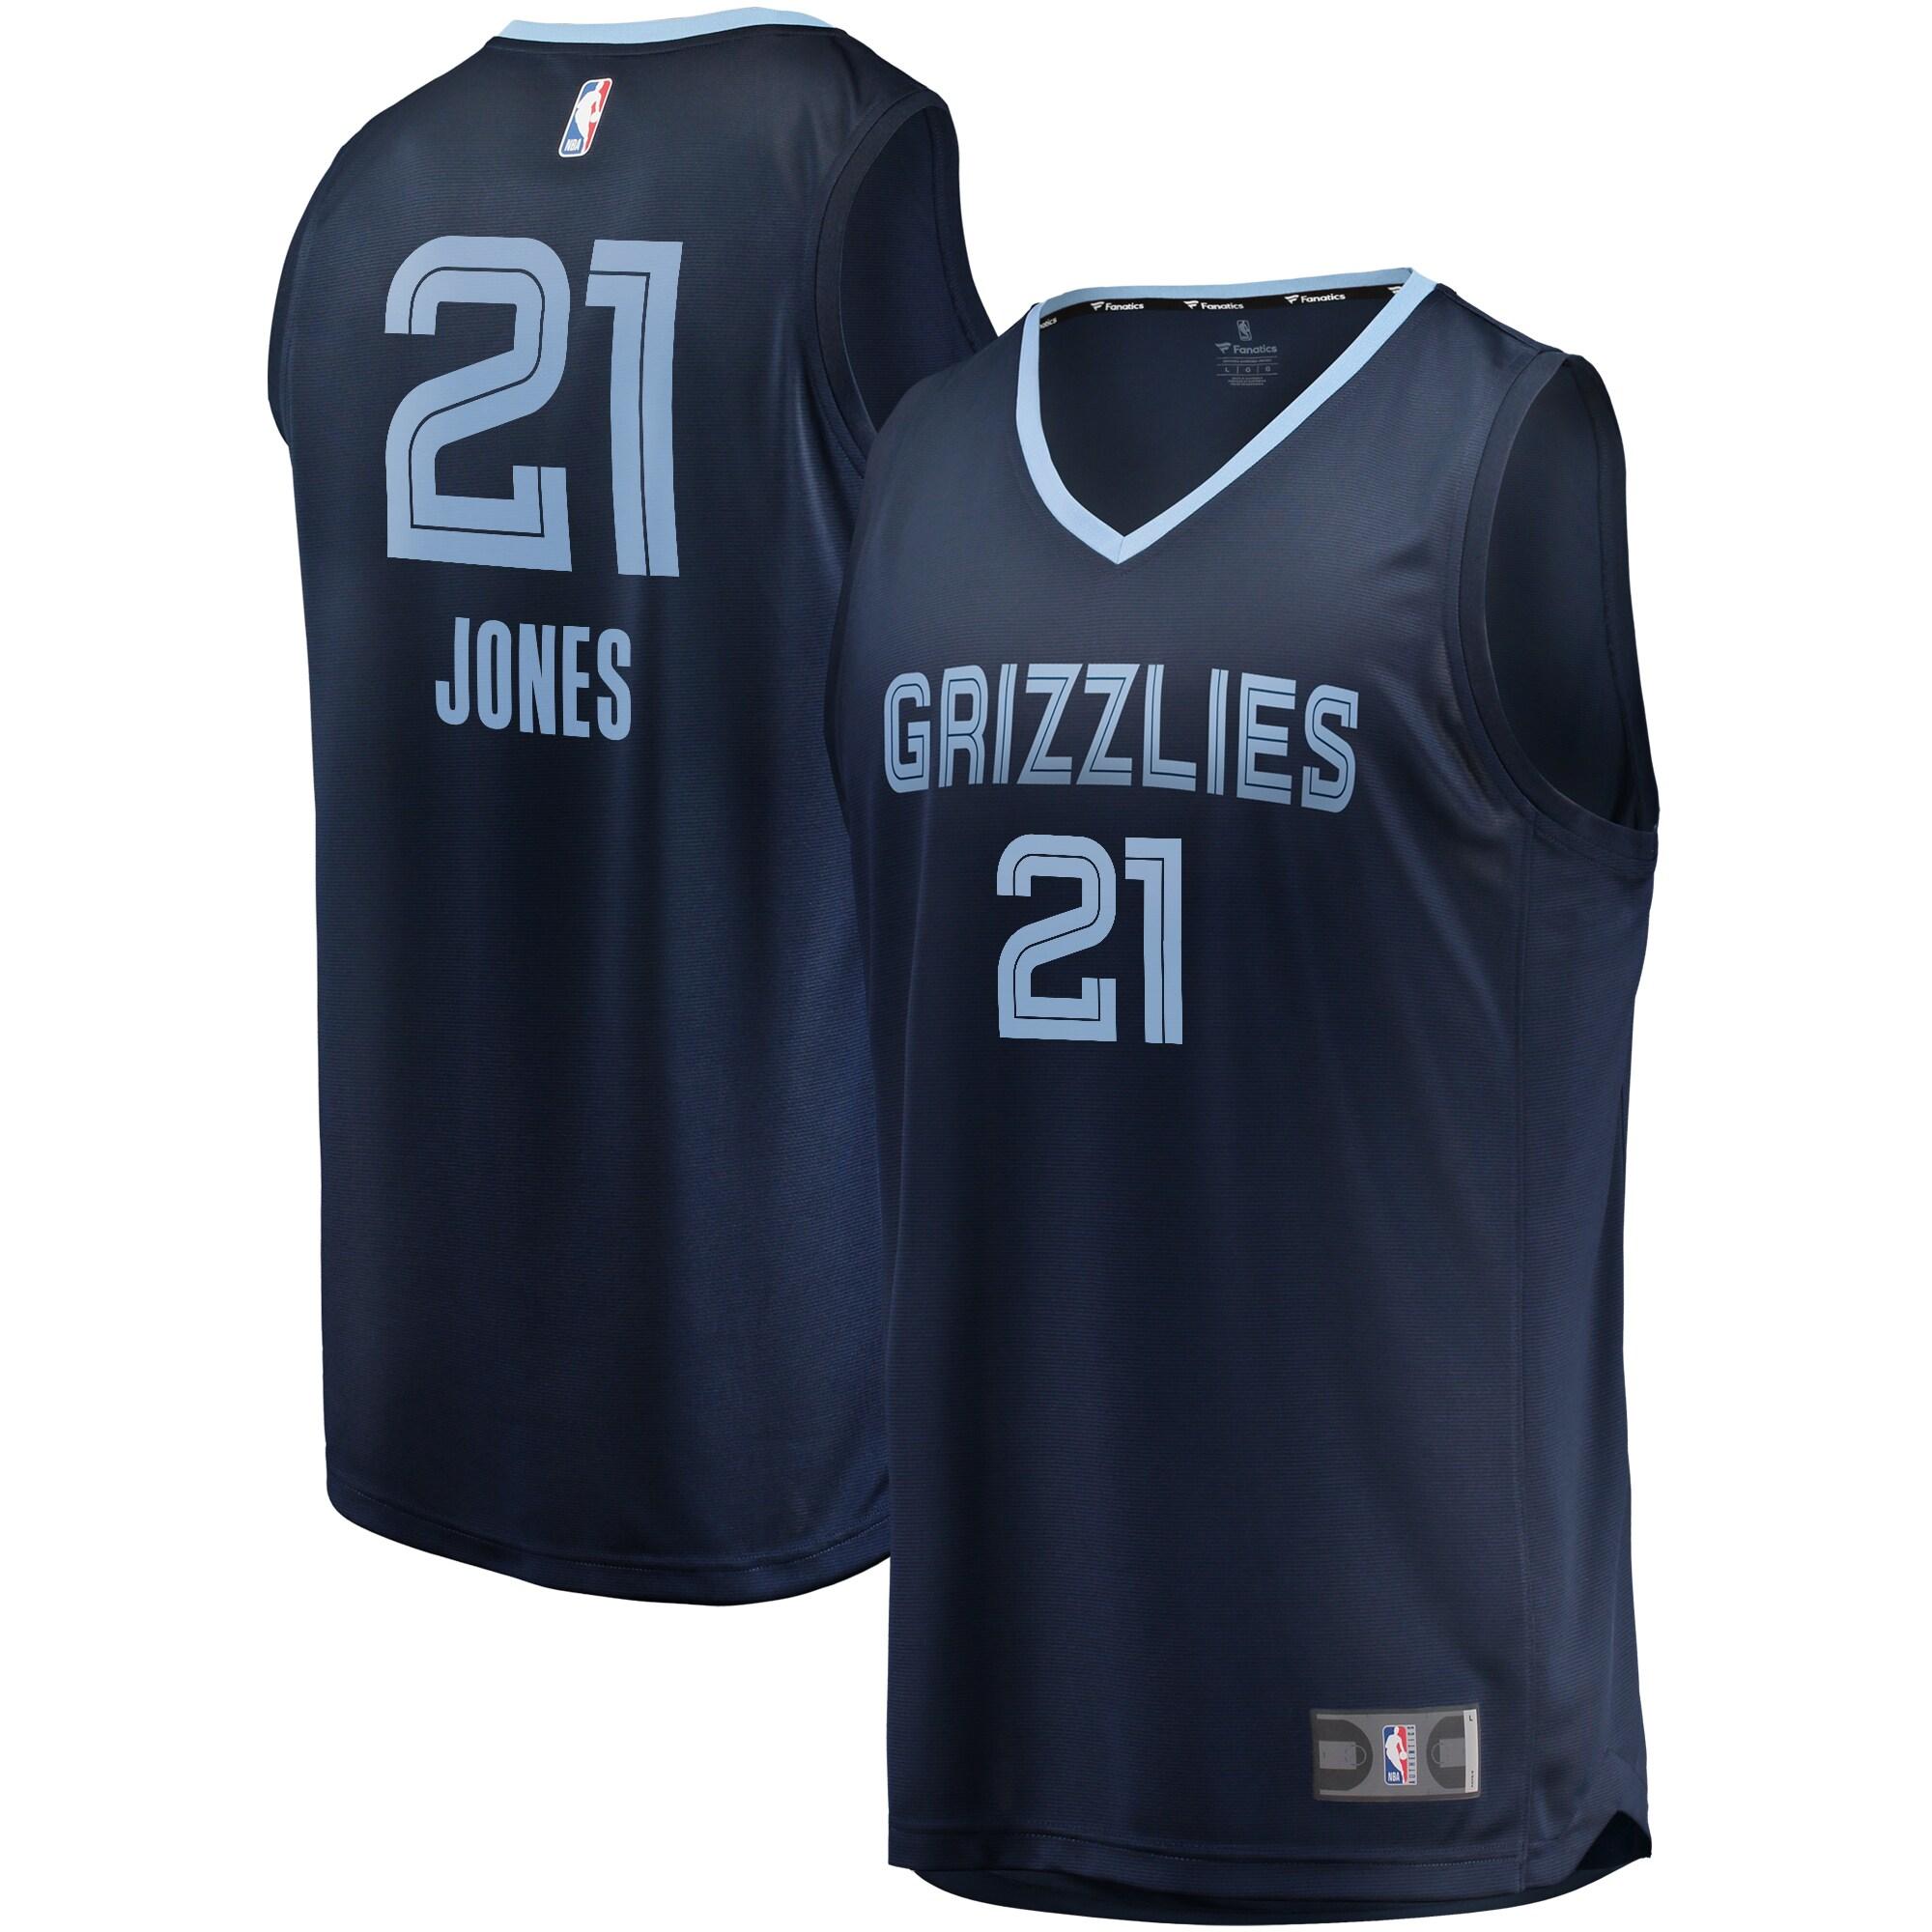 Tyus Jones Memphis Grizzlies Fanatics Branded Fast Break Player Jersey Navy - Icon Edition